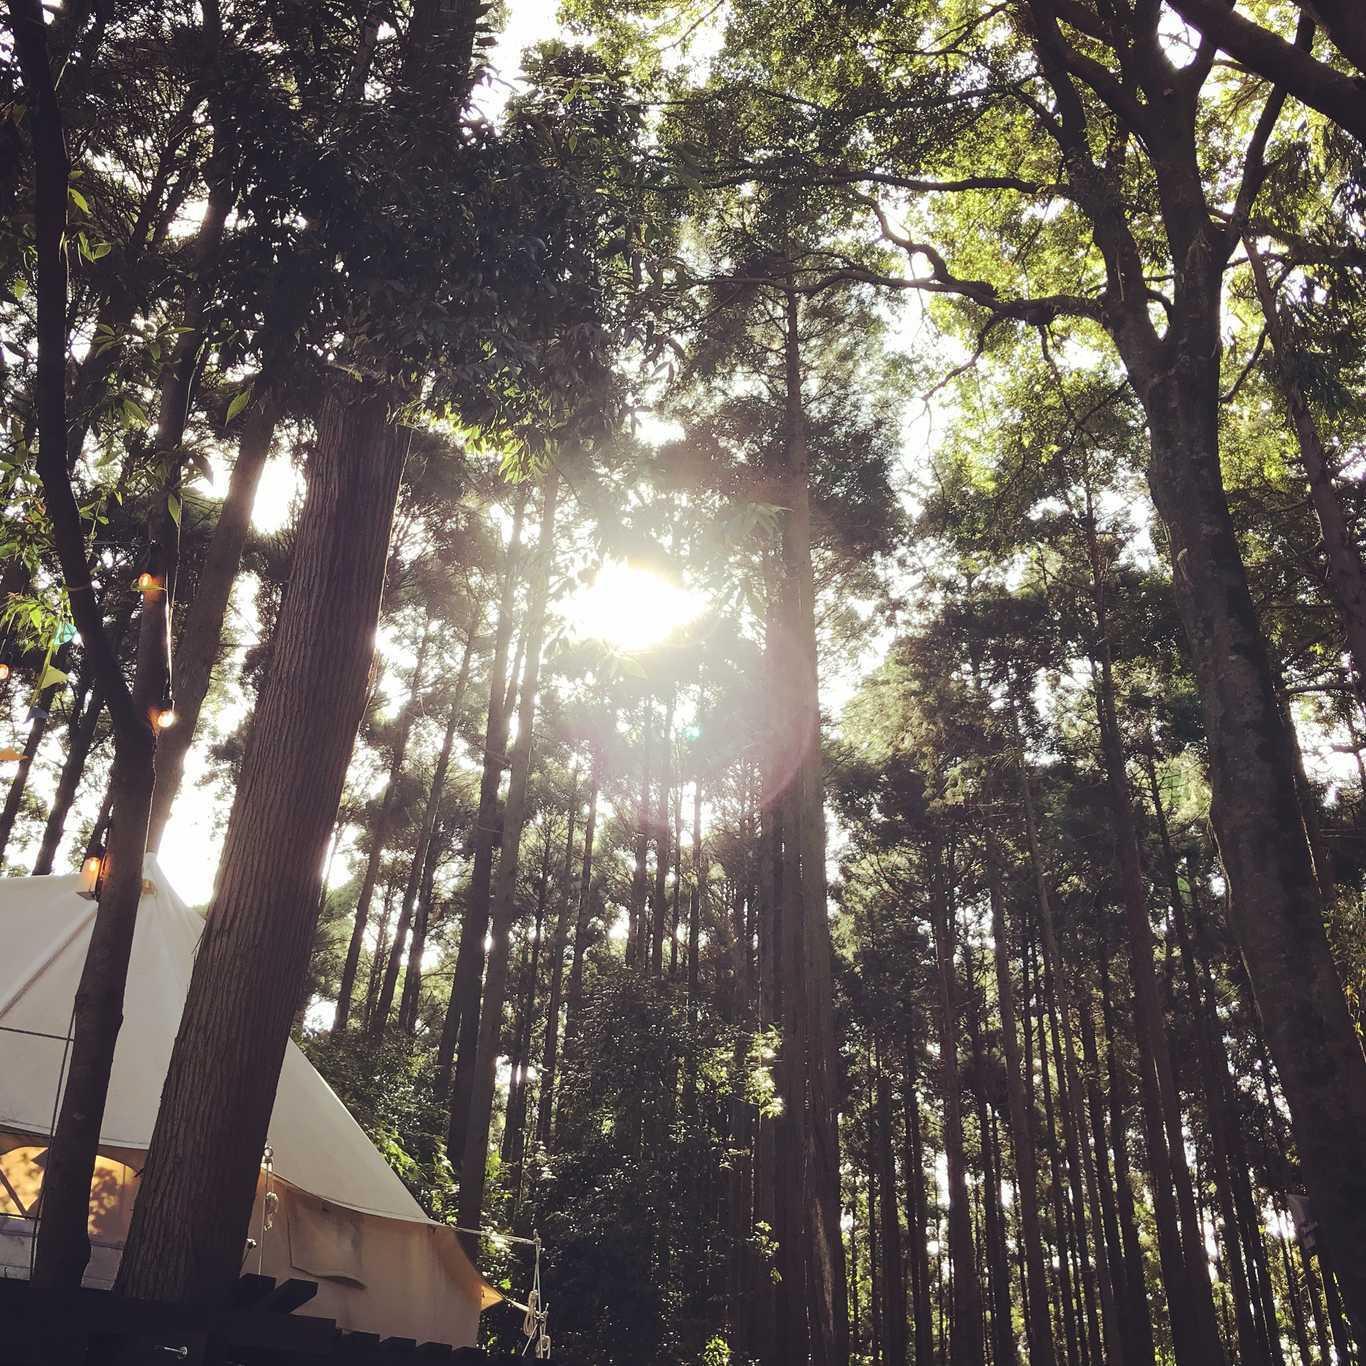 Camping GREEN(キャンピンググリーン) の写真p